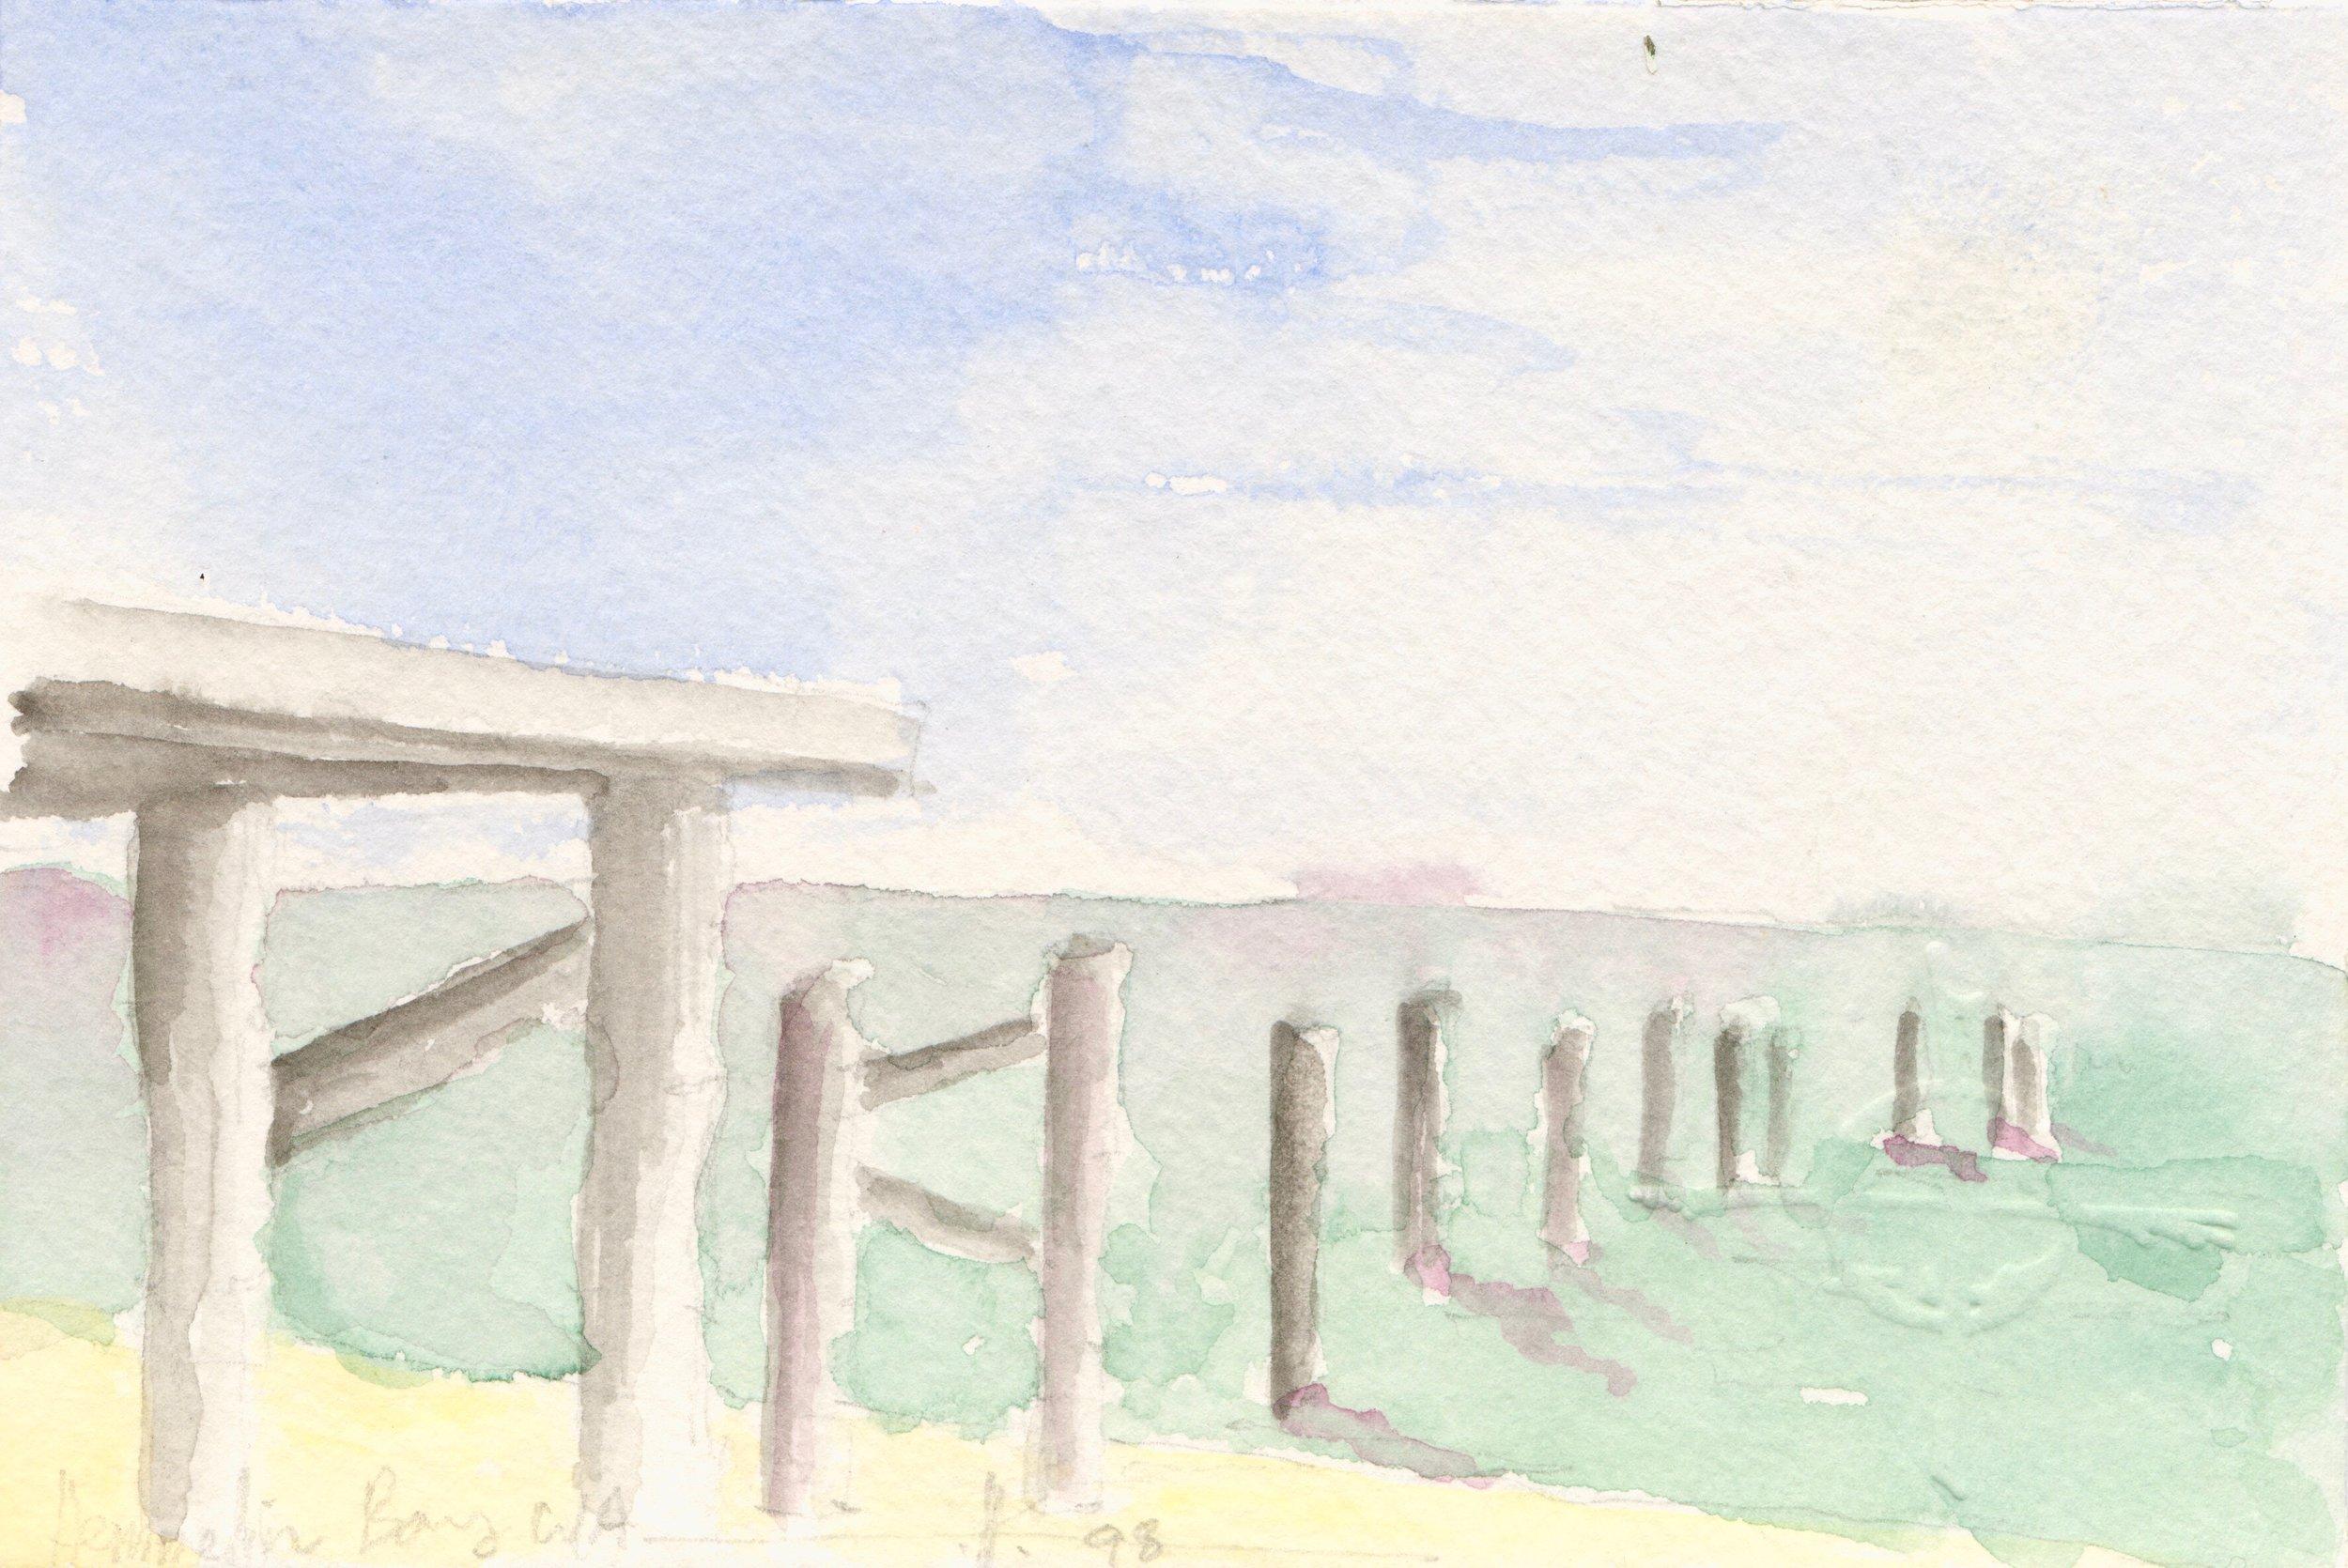 Hamelin Bay 6, W.A. 98-181211-0011.jpg